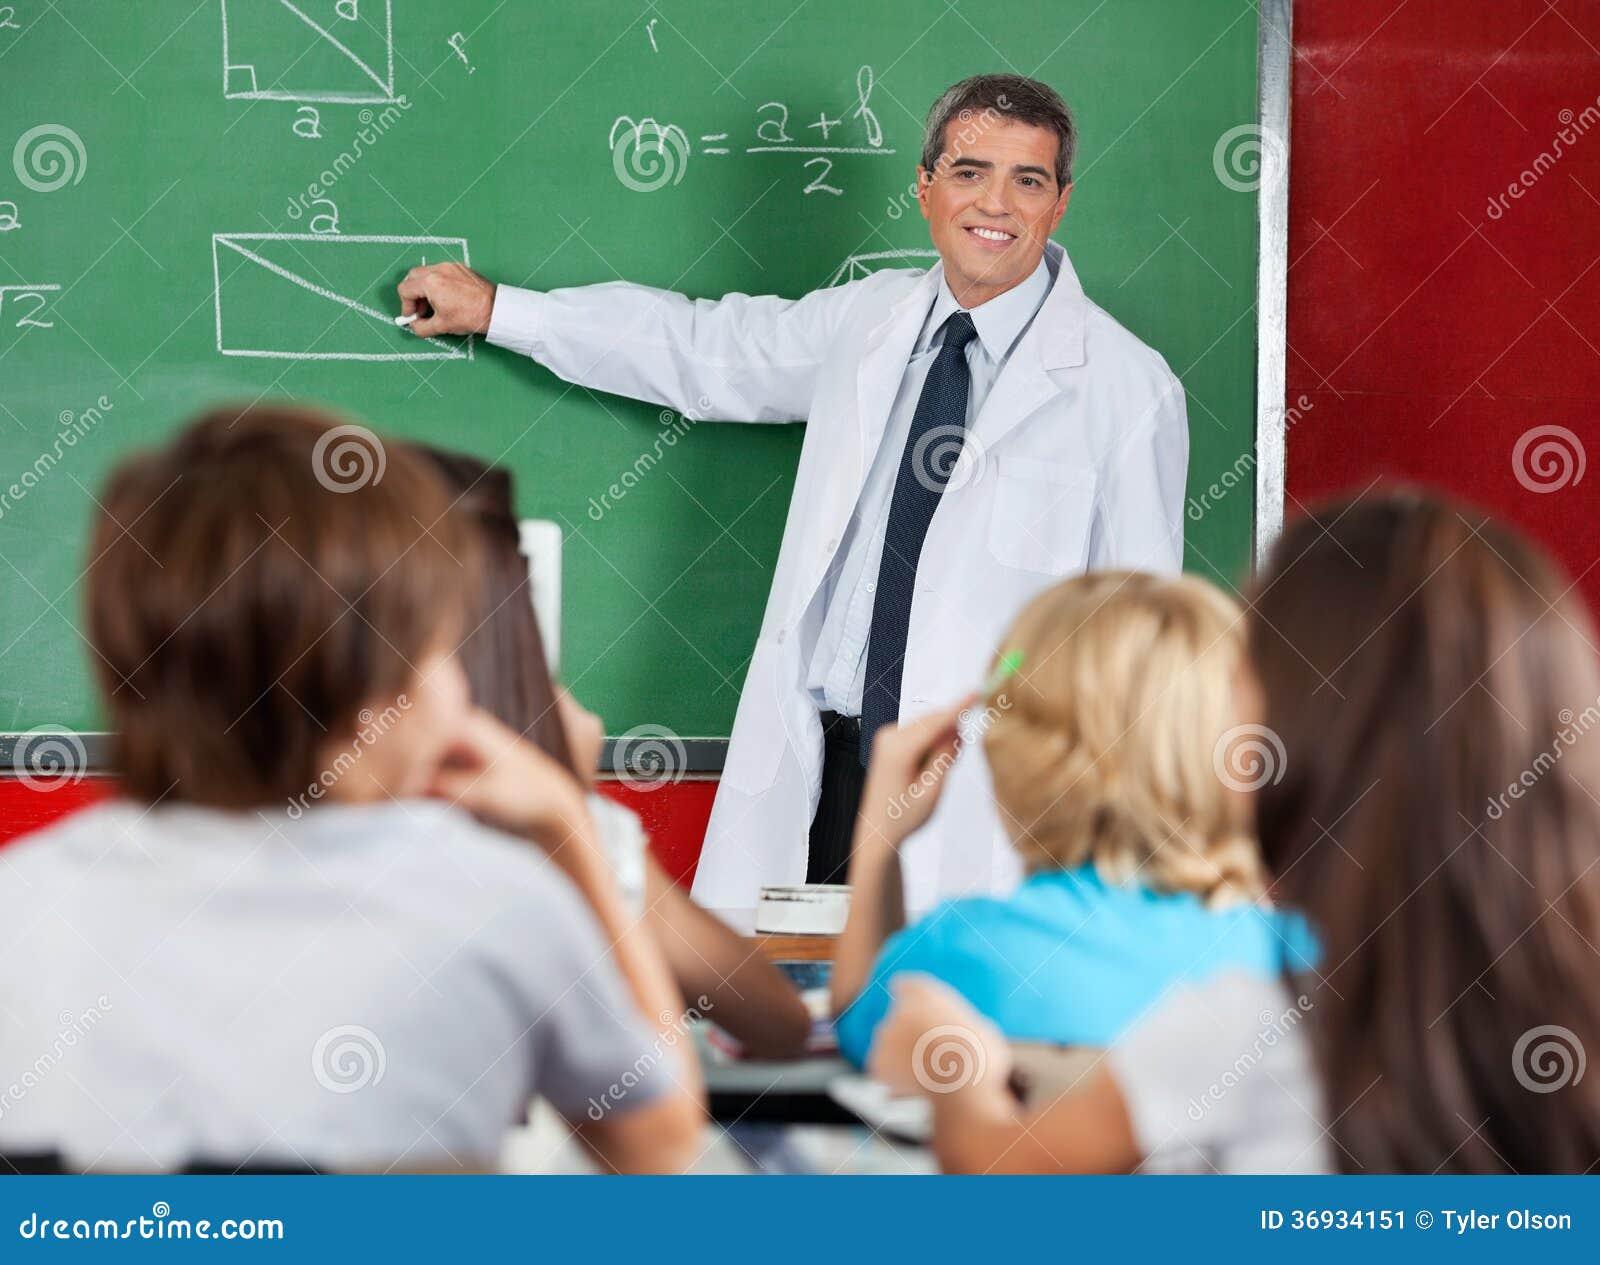 Teacher Teaching Geometry To Schoolchildren Stock Image - Image ...